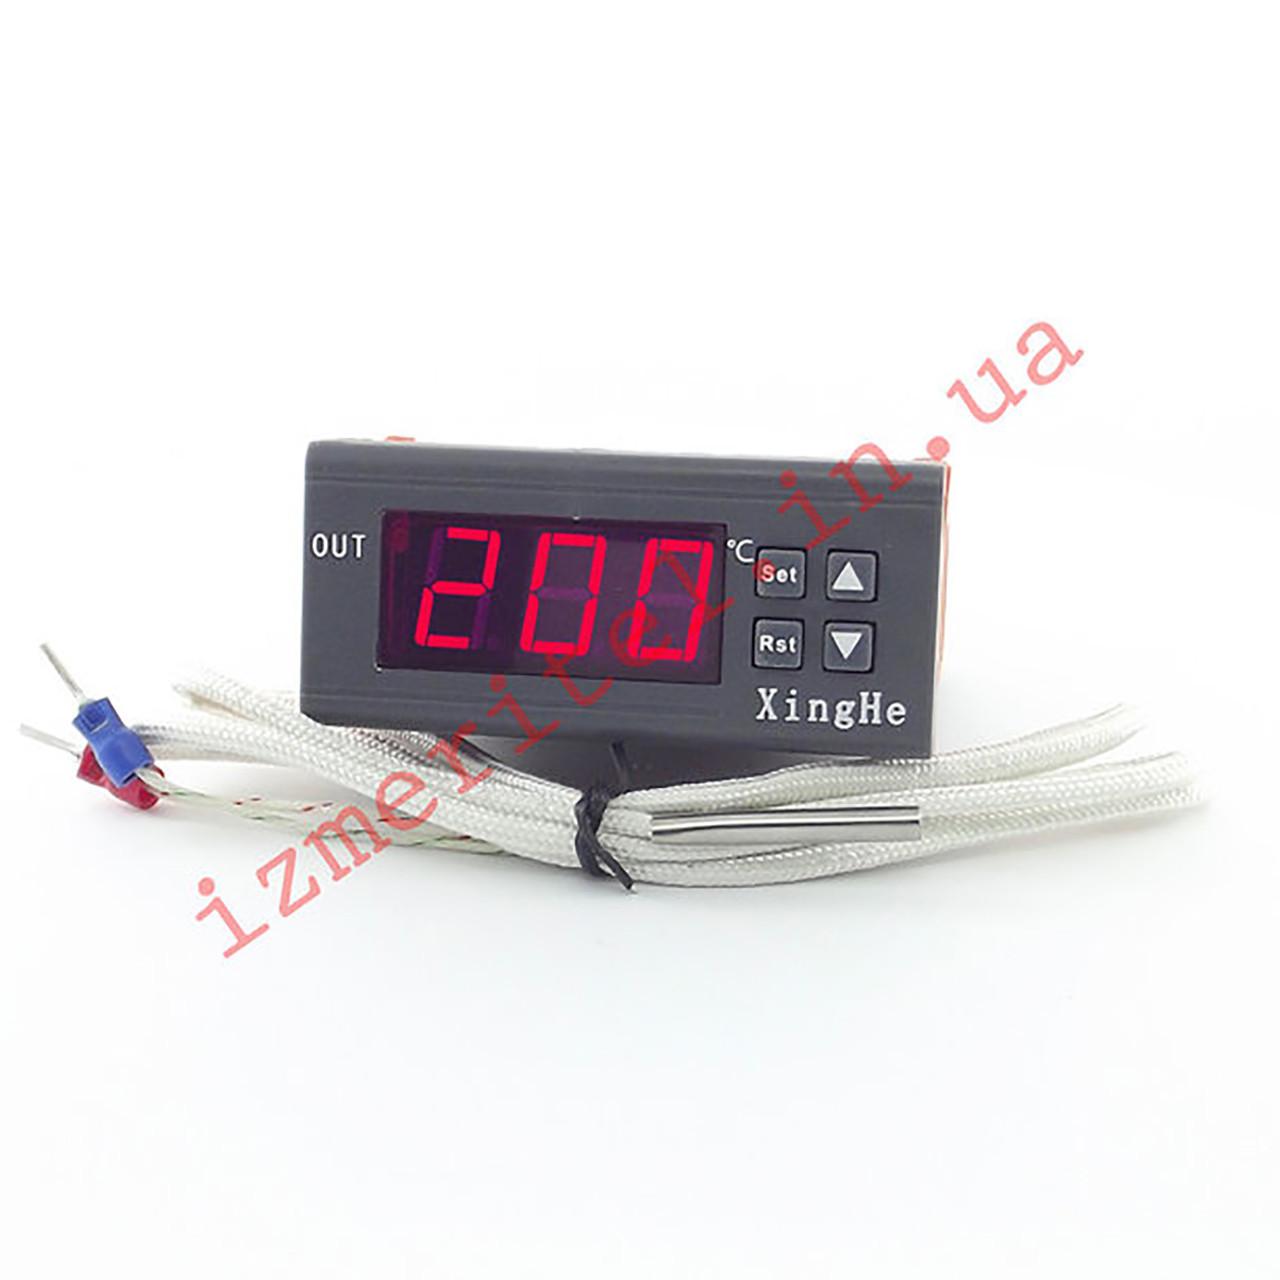 Высокотемпературный терморегулятор W2030 220v